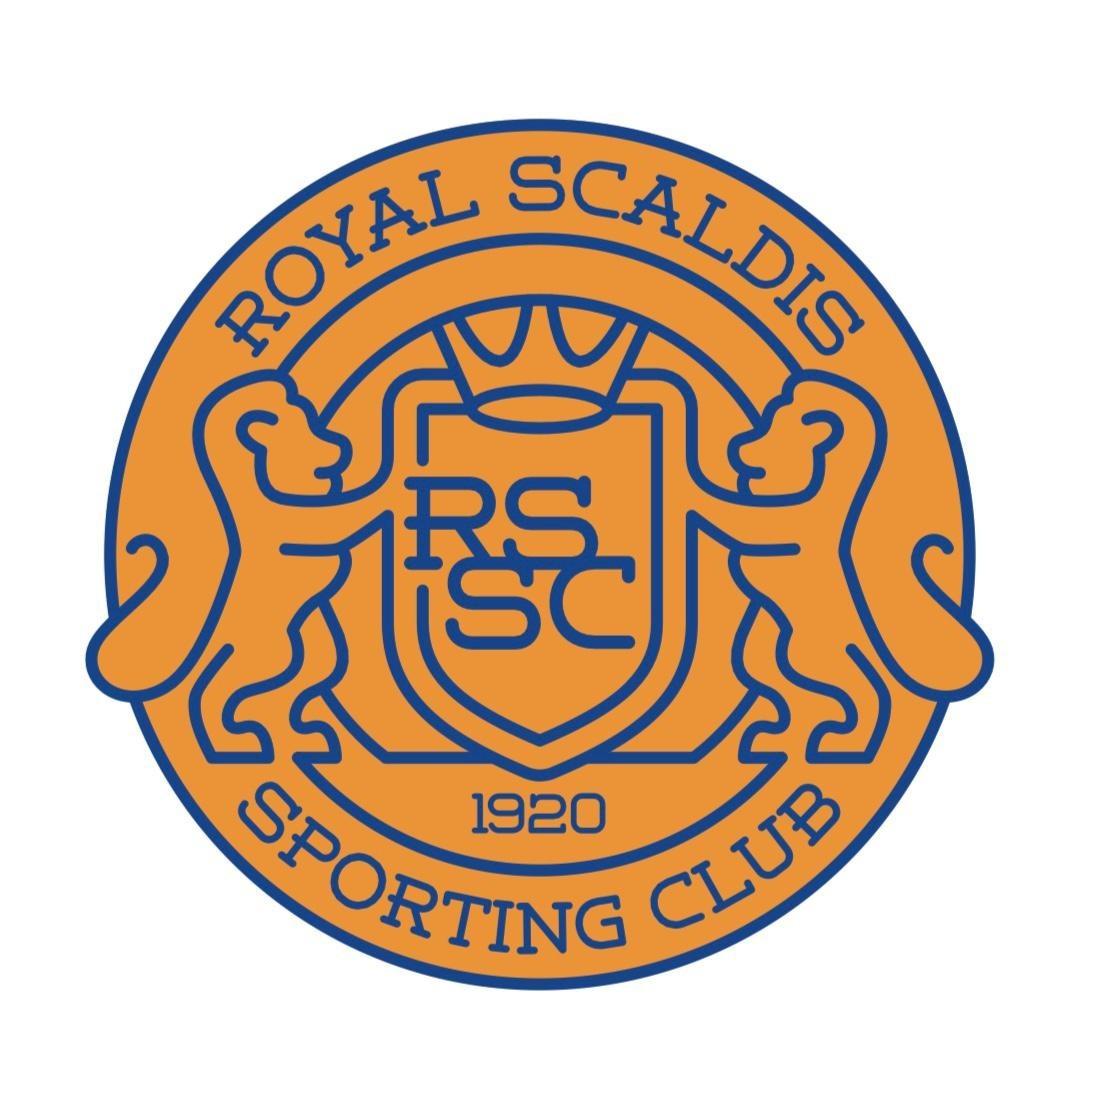 Scaldis logo 100!